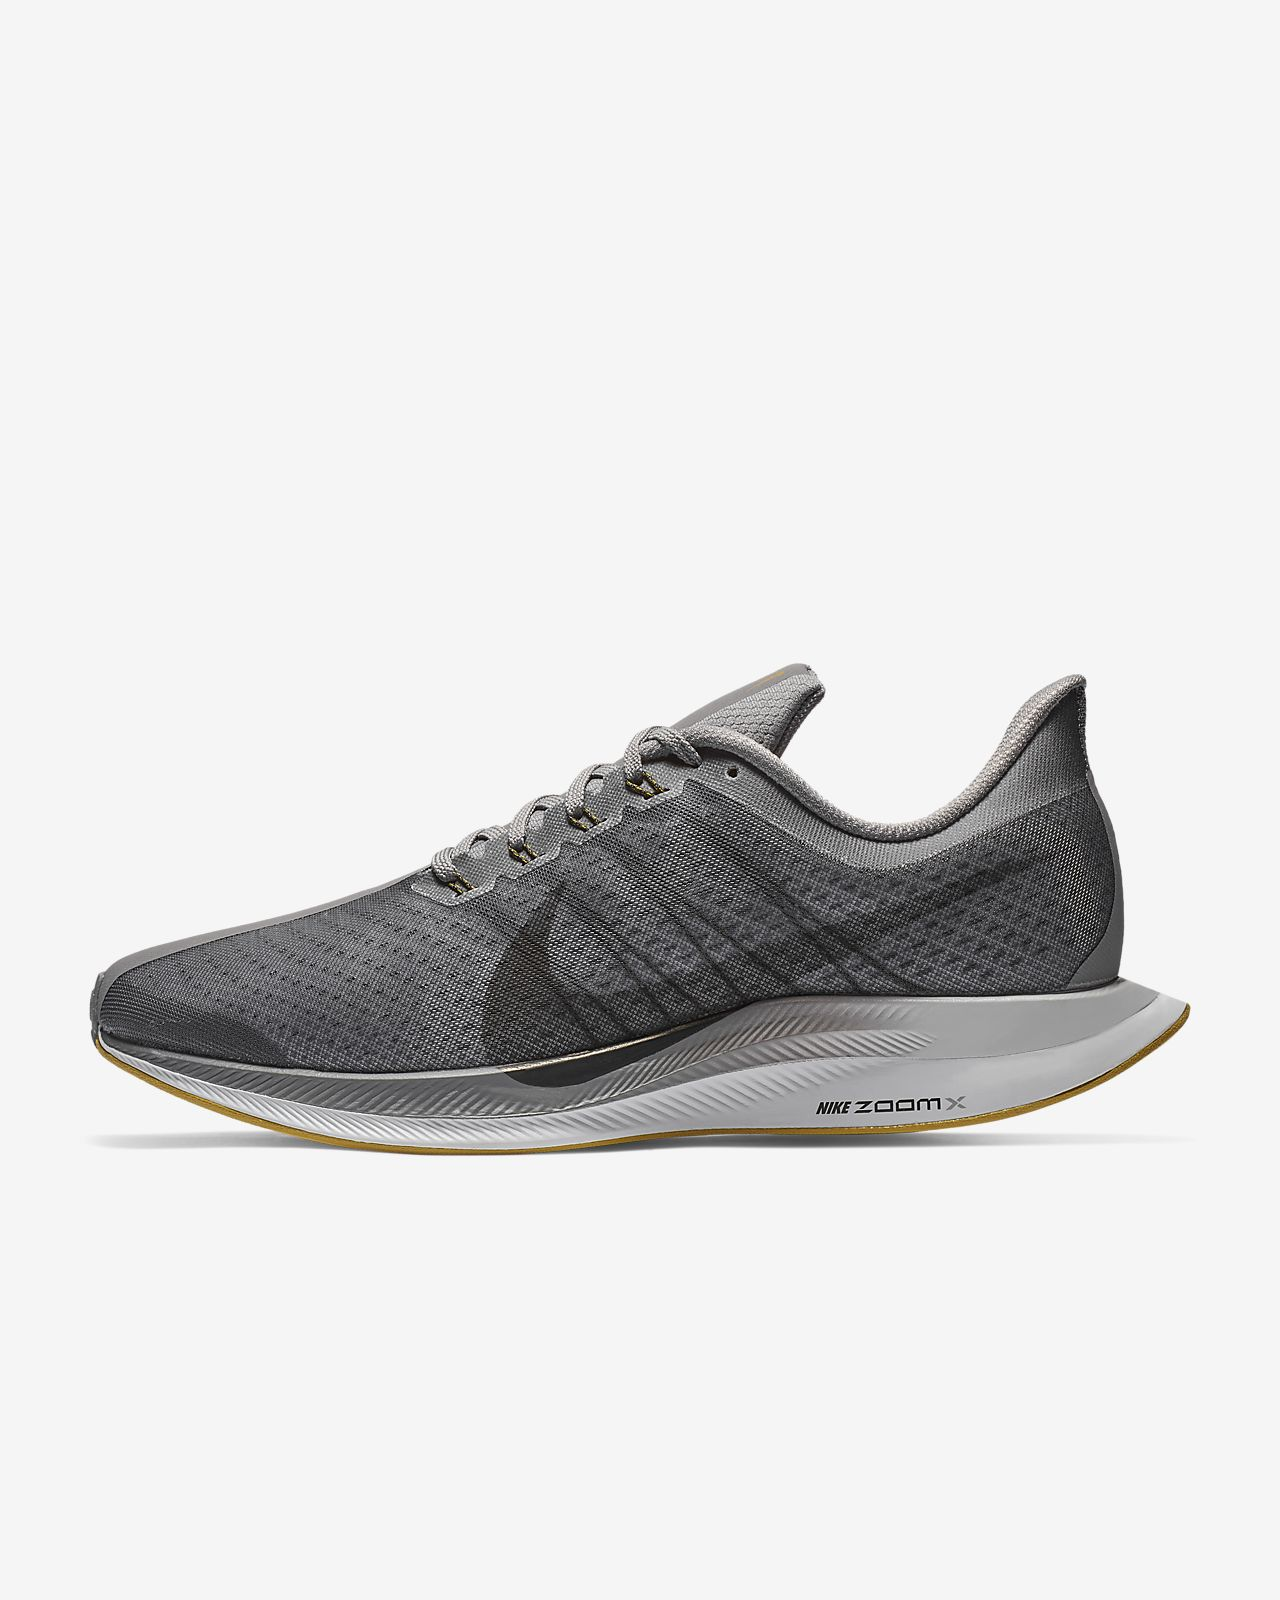 De Turbo Nike Zoom Homme Pour Ca Chaussure Running Pegasus R7dqwpxp